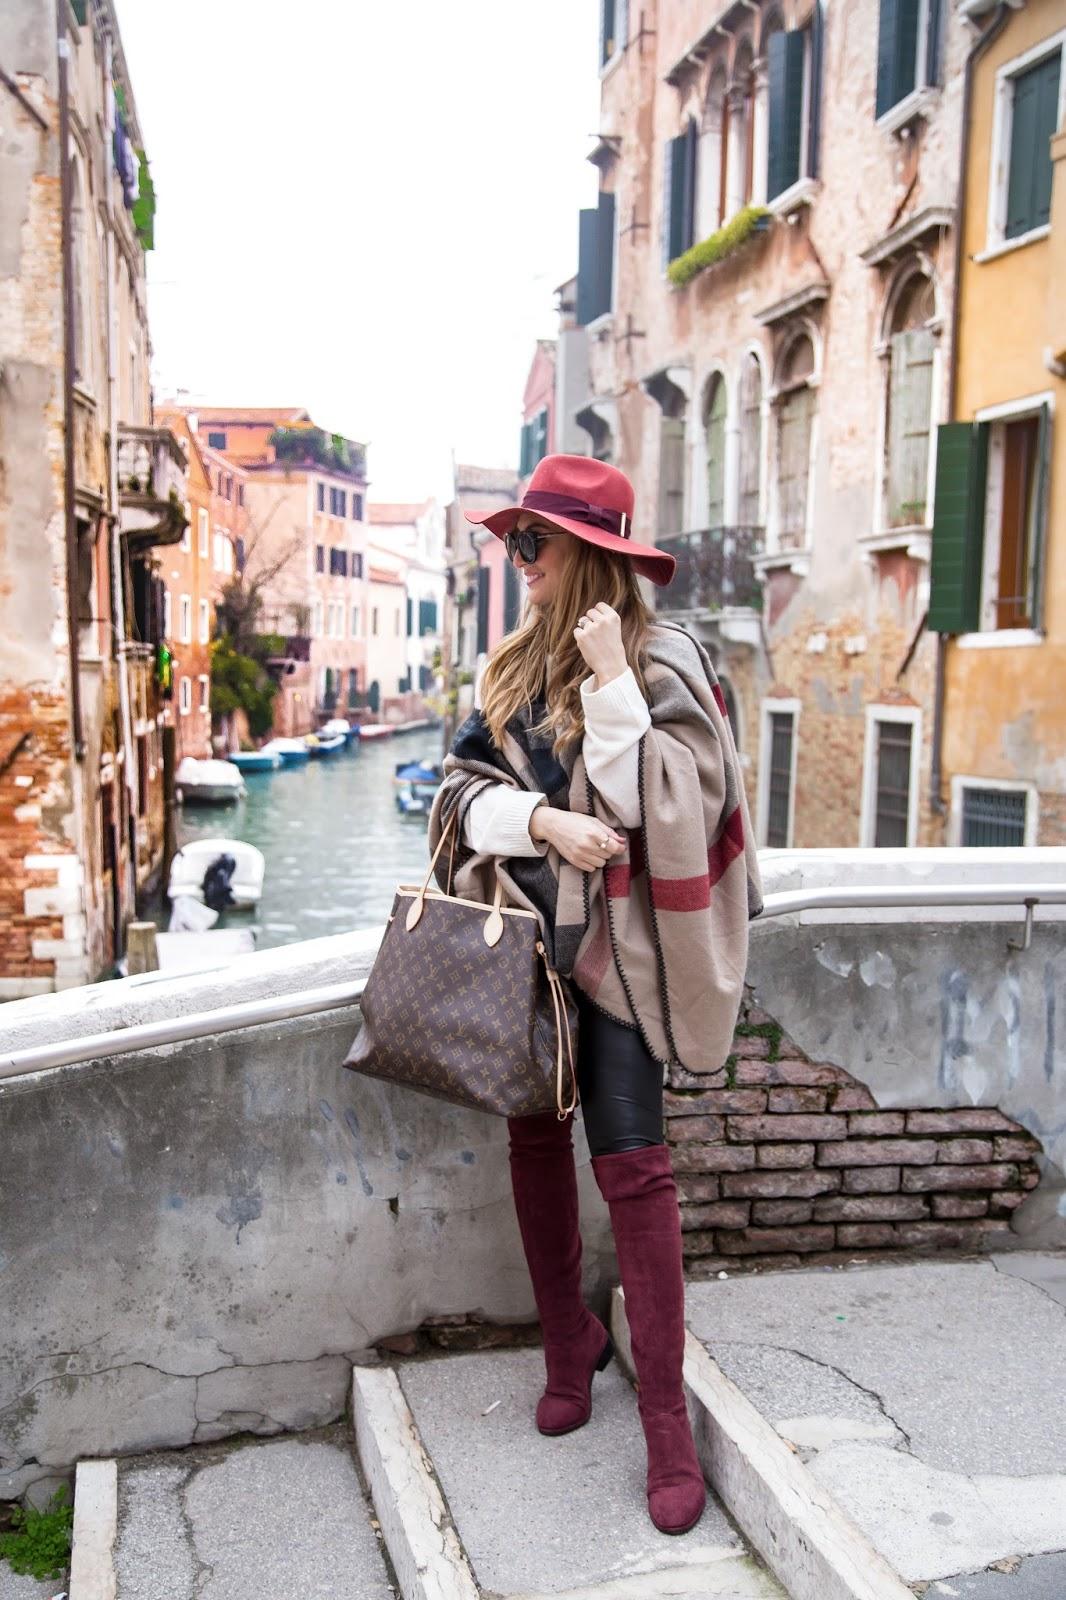 burberry-poncho-klassich-weinroter-Hut-fedora-hut-louis-vuitton-tasche-neverfull-gm-tache-was-trage-ich-im-winter-winter-outfits-fashionblogger-blogger-style-im-winter